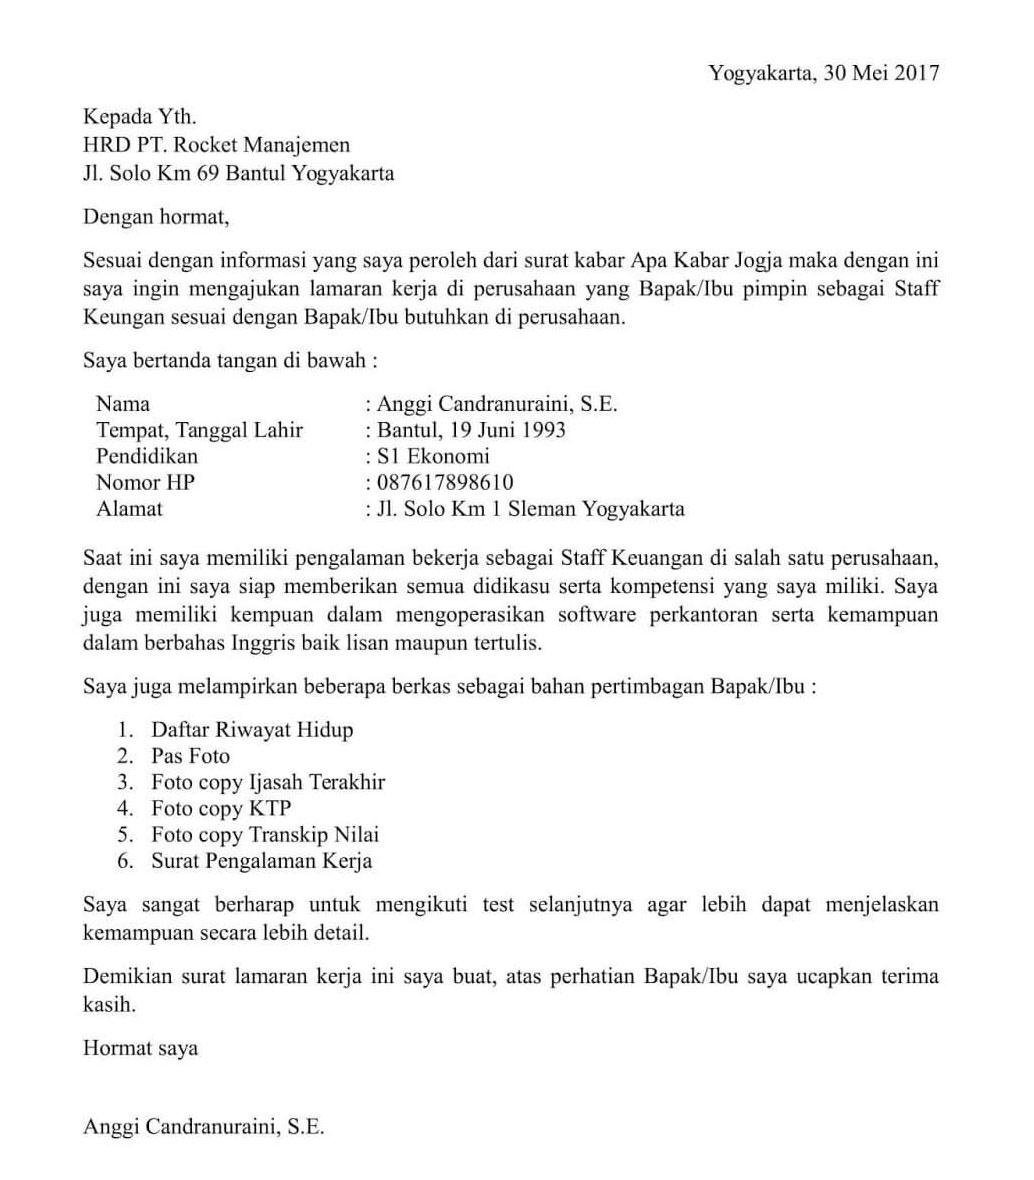 Contoh Surat Lamaran Kerja Lowongan Kerja Kalimantan Tengah